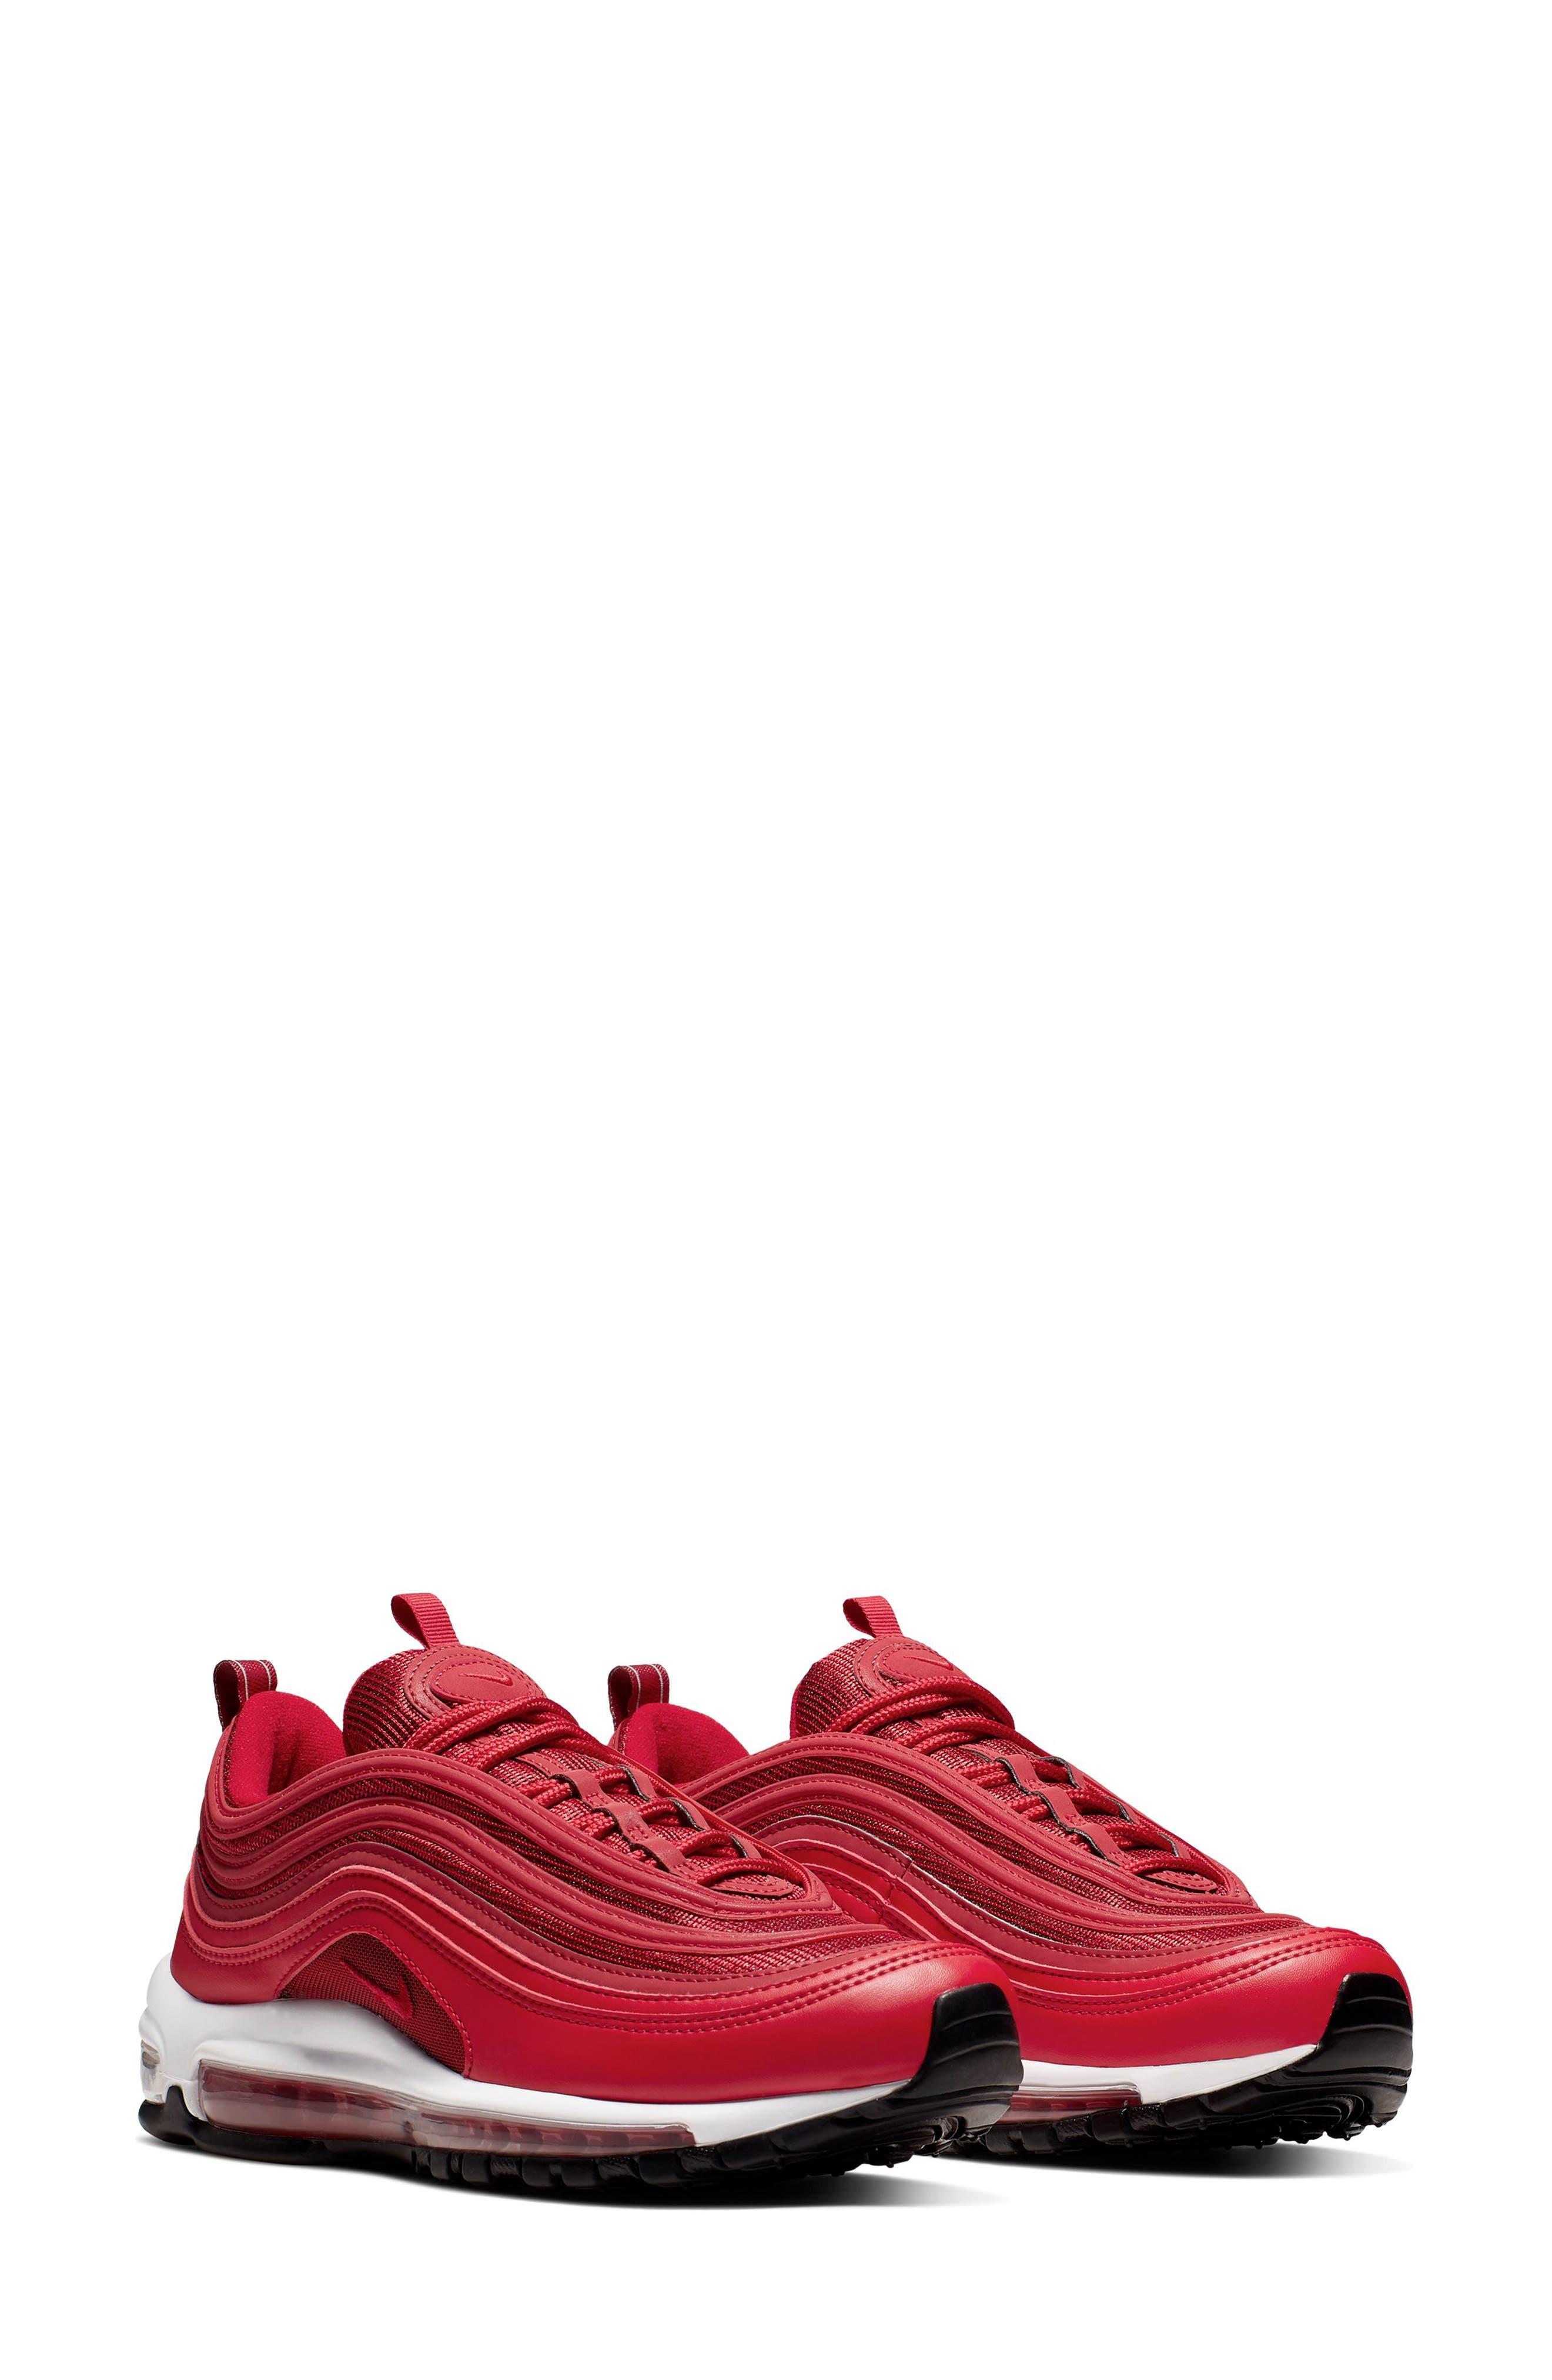 red air max 97 womens